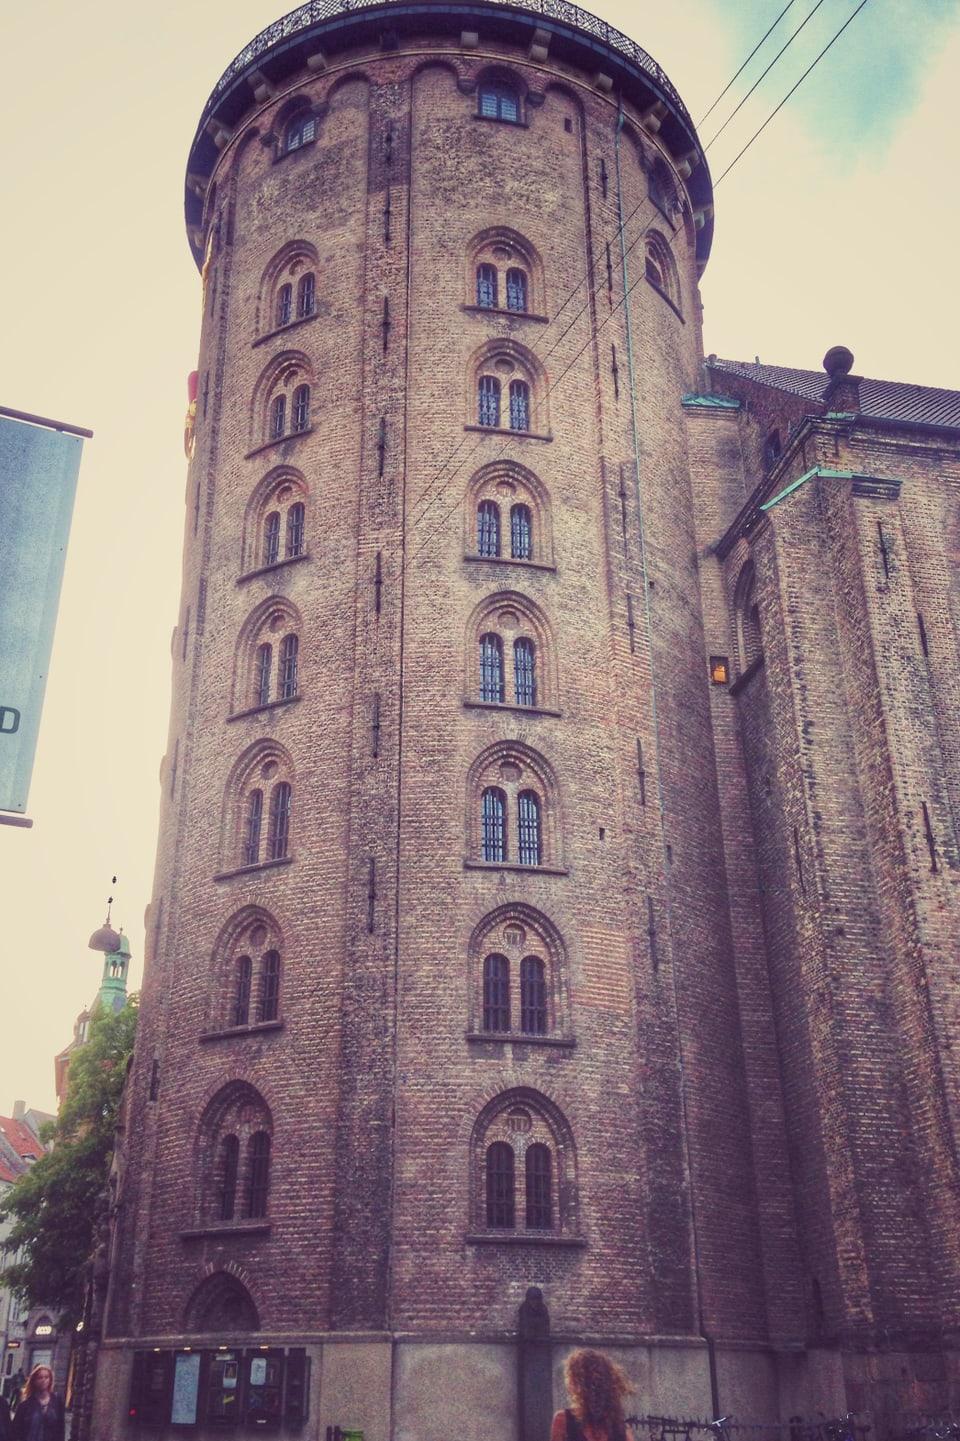 La tur radunda Rundetårn.